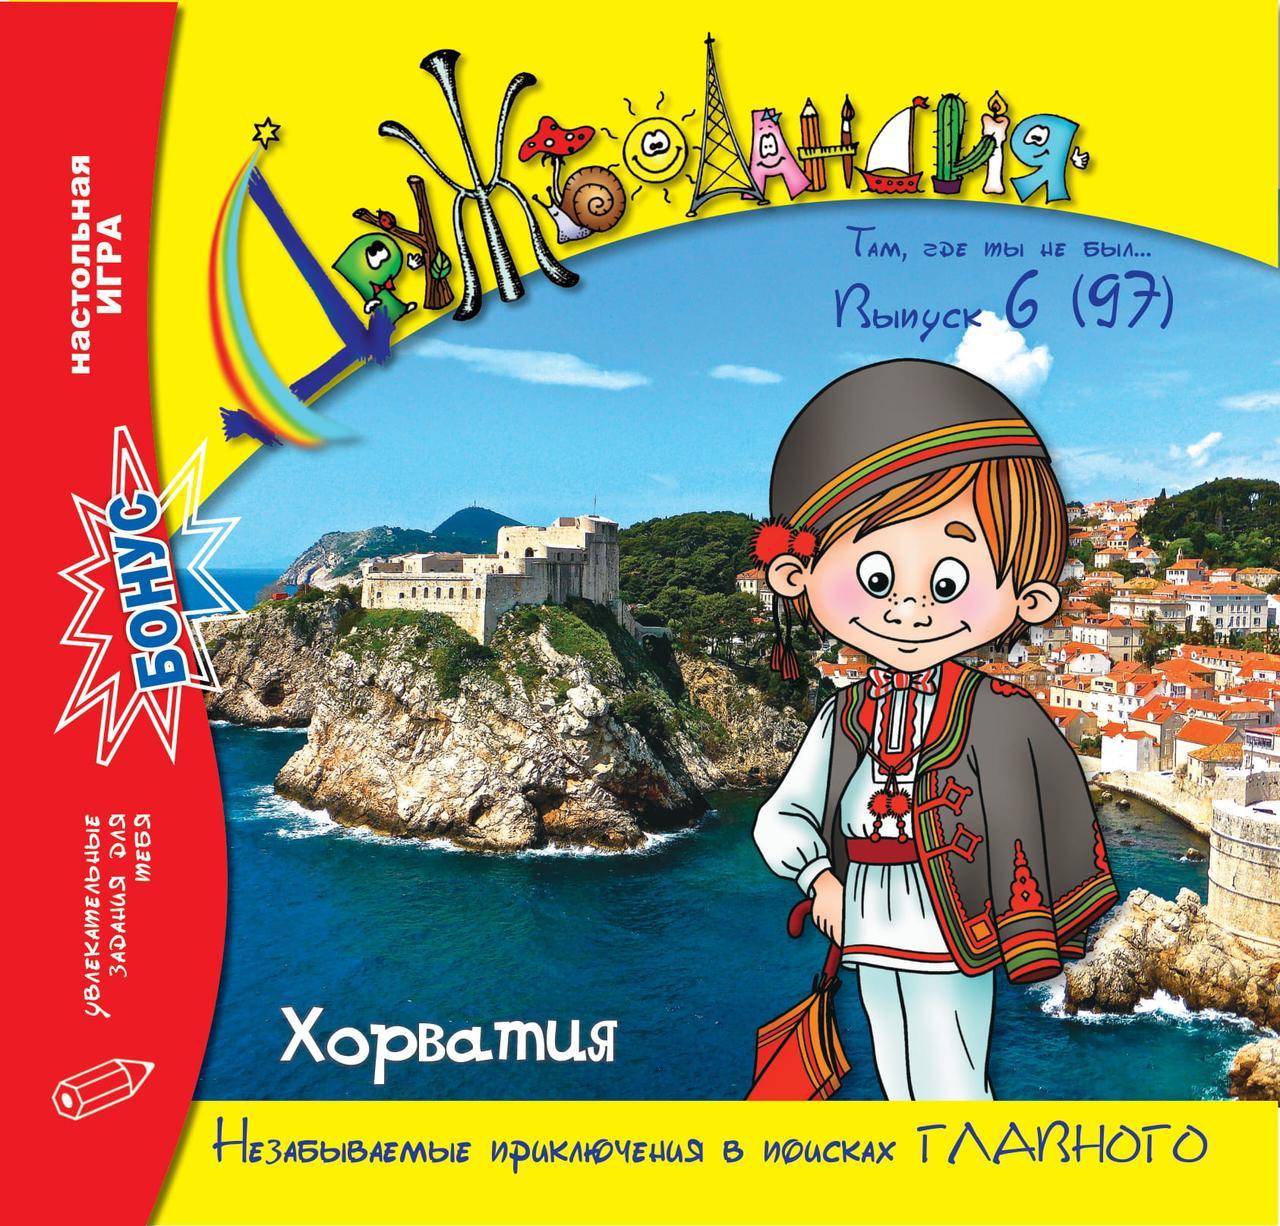 Дружболандия № 06-2020 (рус.) – Хорватия